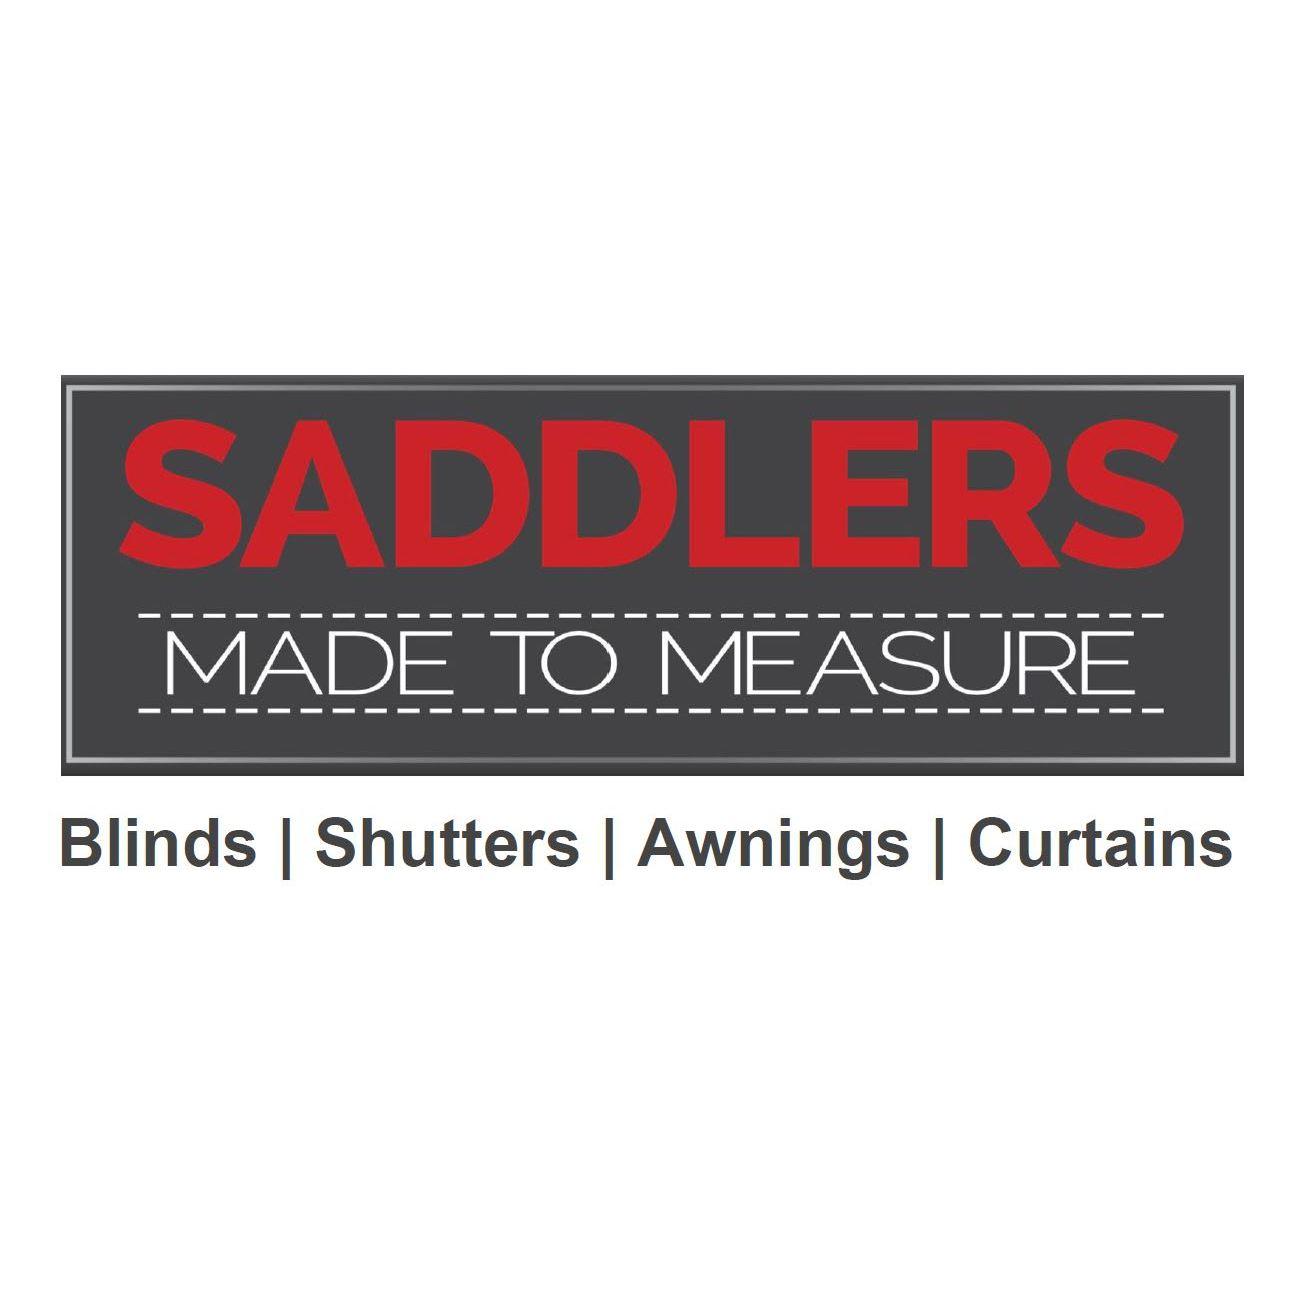 Saddlers Blinds - Hassocks, West Sussex BN6 9GL - 01403 865353 | ShowMeLocal.com